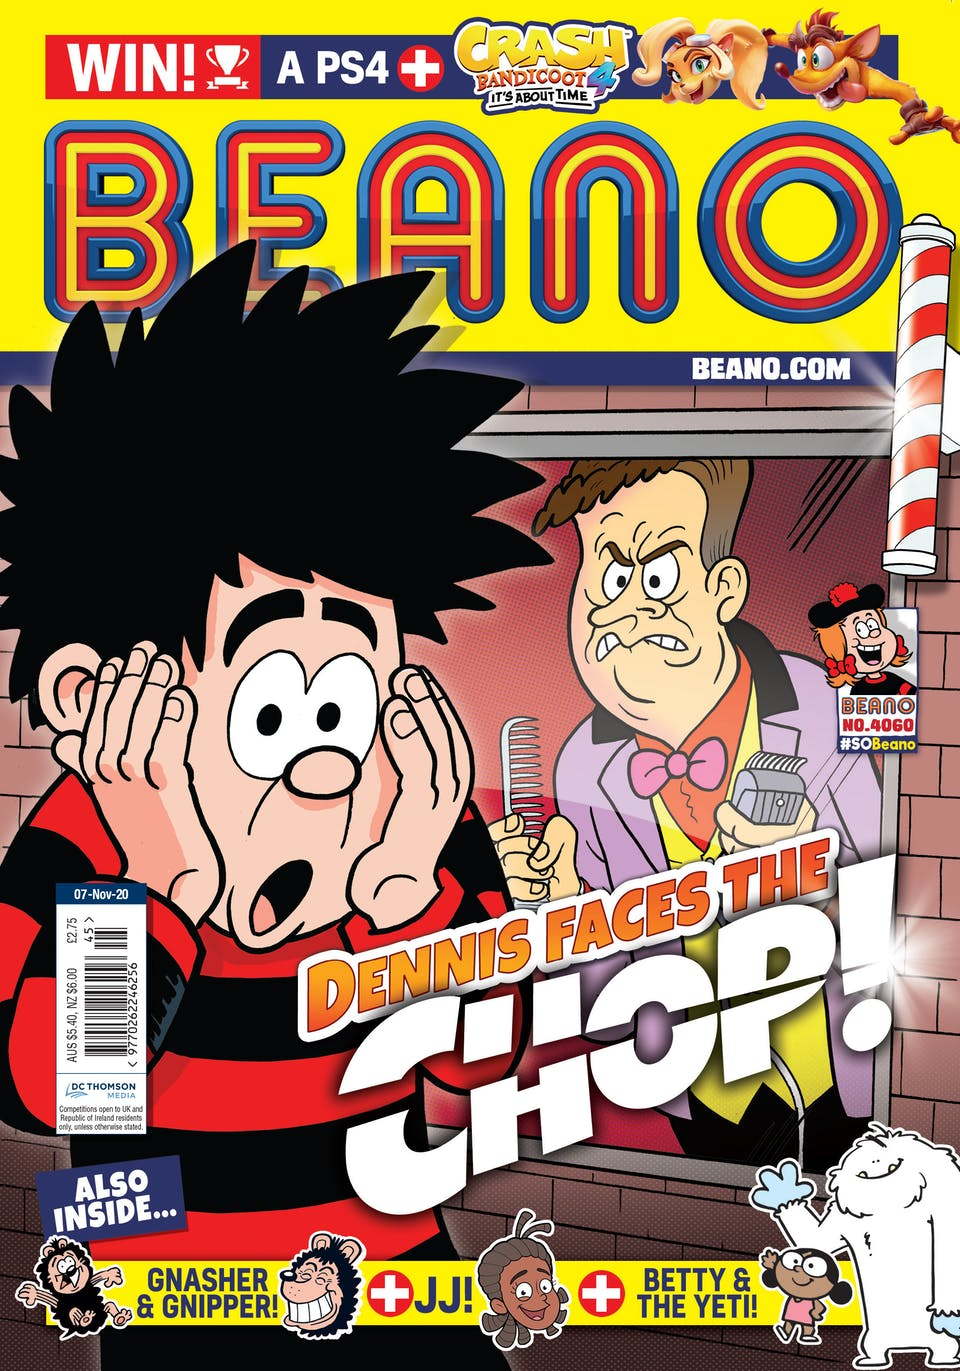 Inside Beano no. 4060 - Dennis is facing the chop!